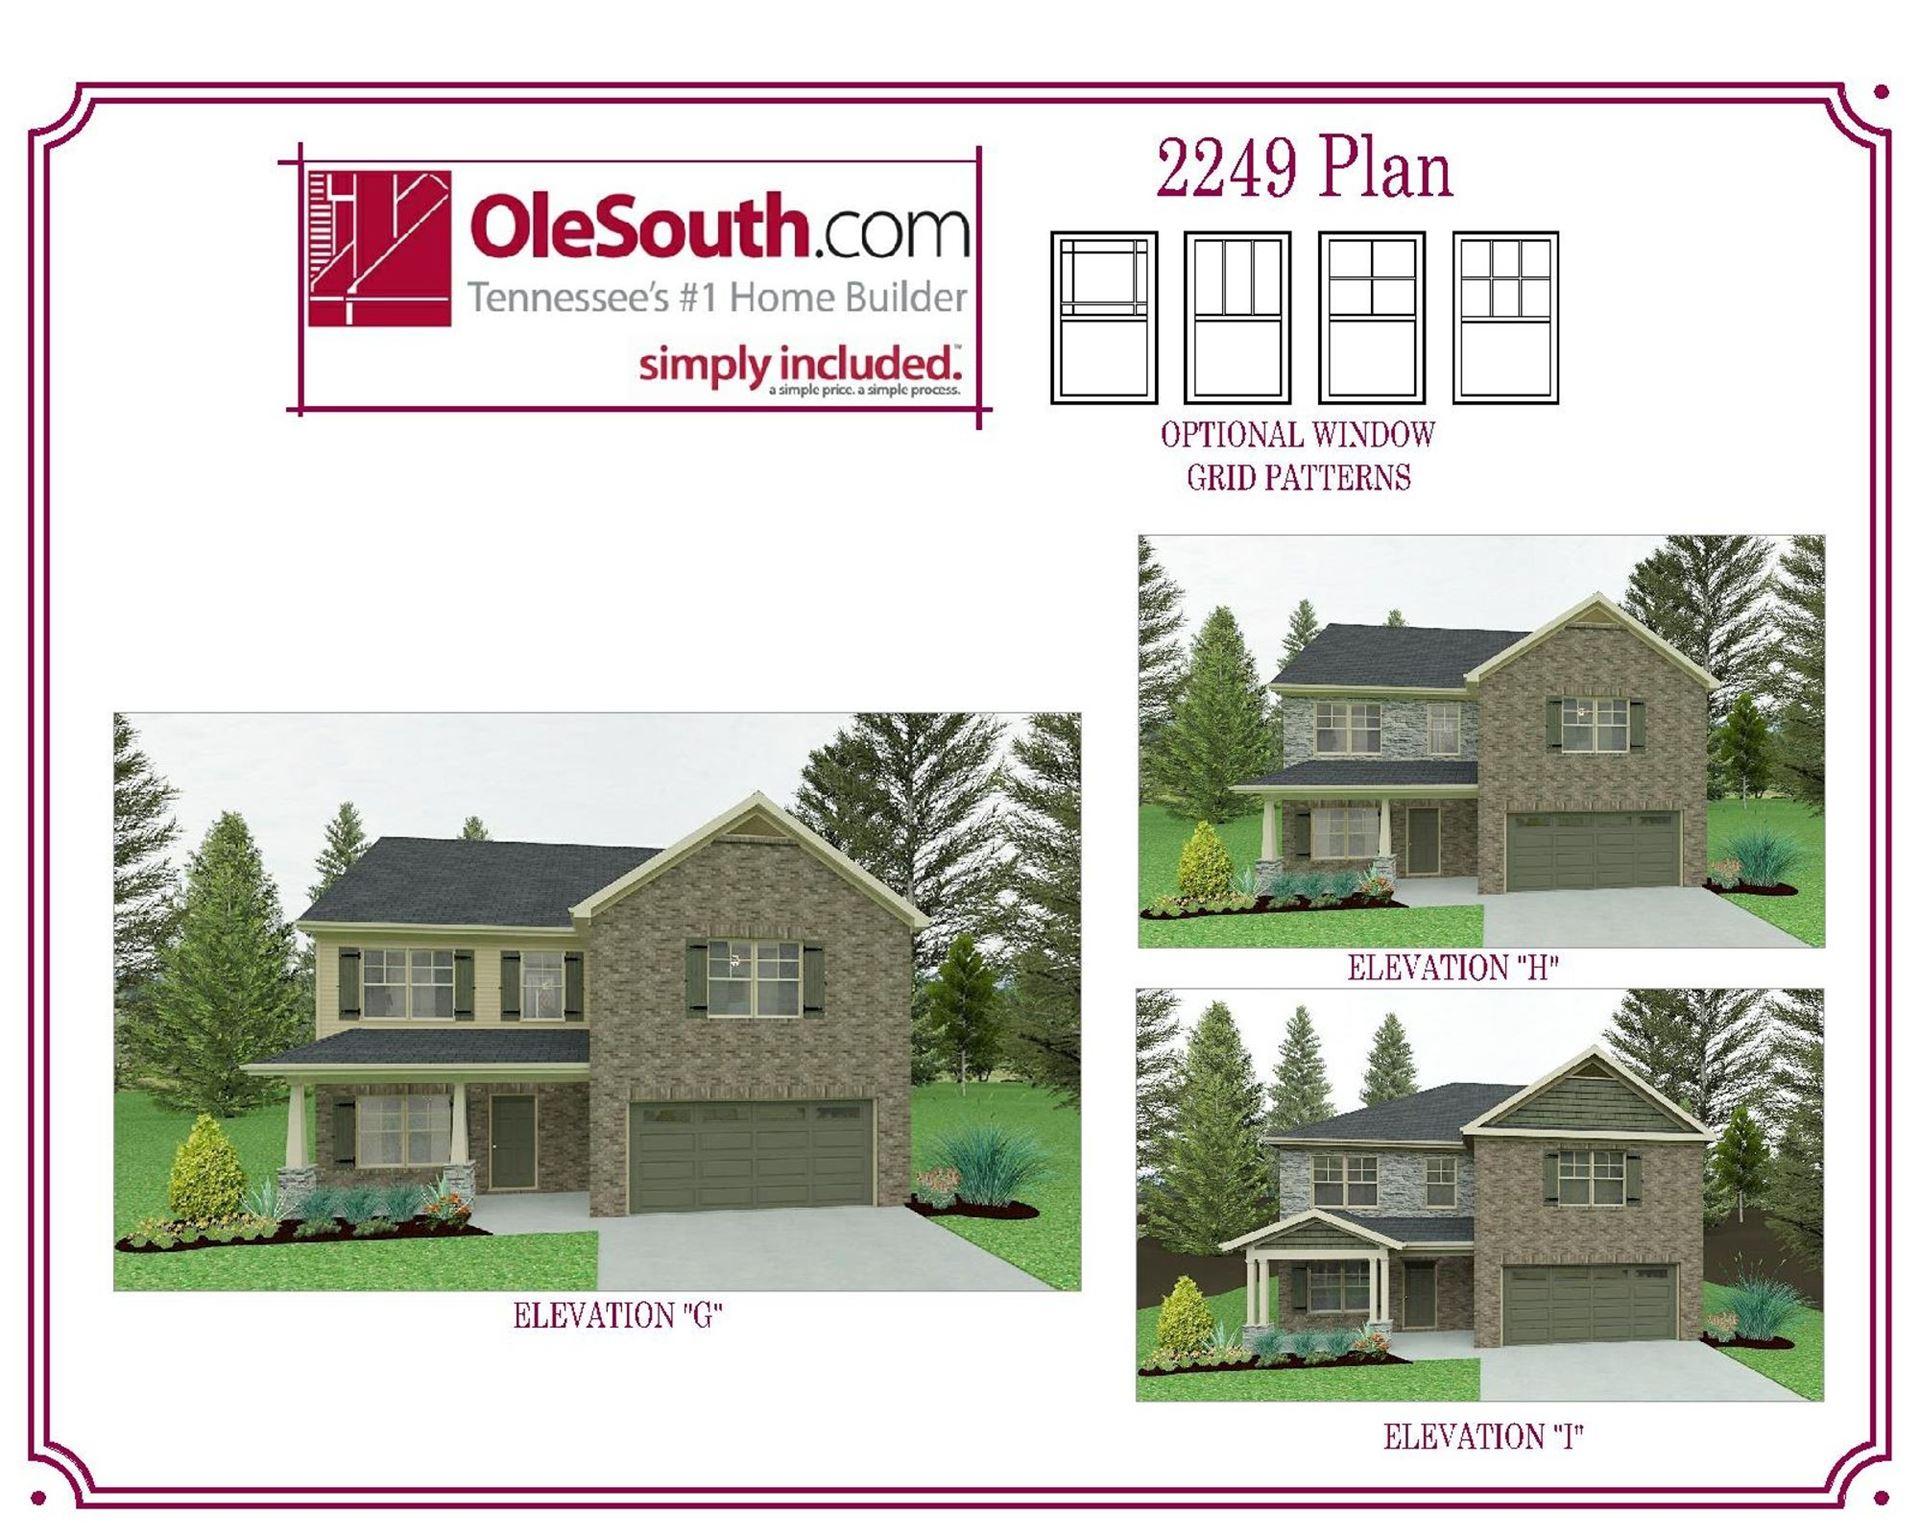 797 Callie Lane (Lot 47), Pleasant View, TN 37146 - MLS#: 2275621